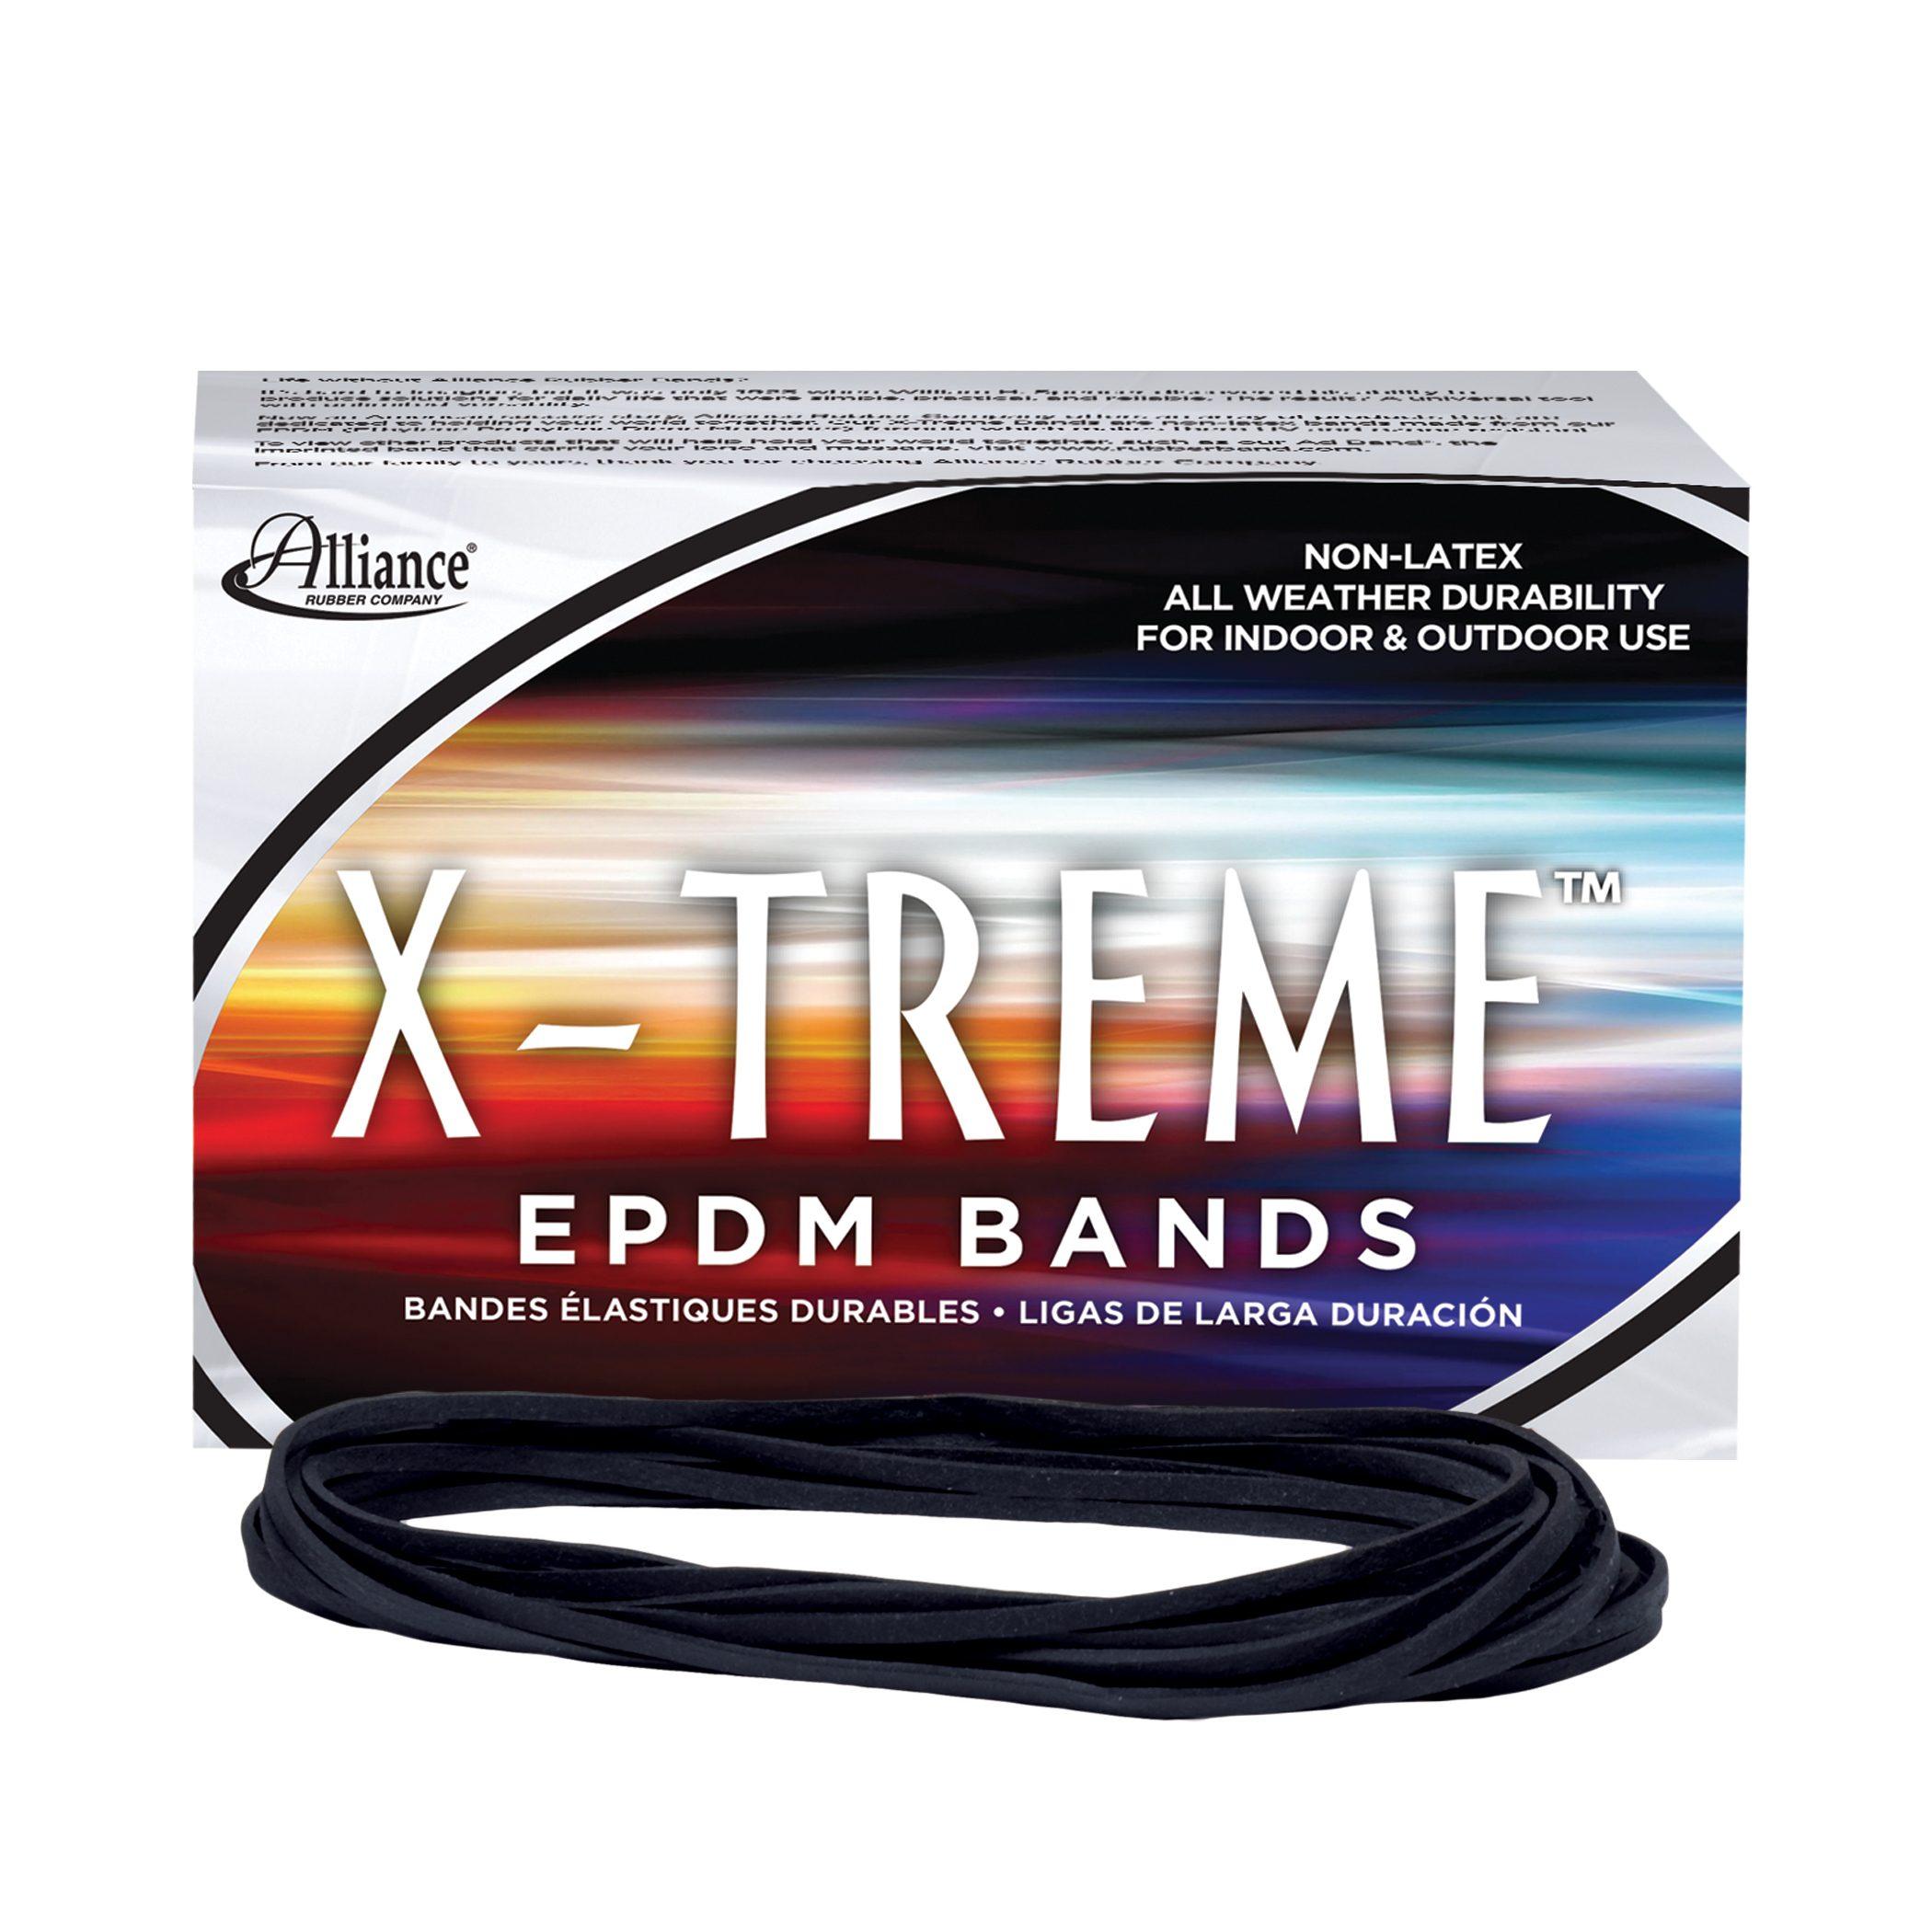 X-treme-EPDM-bands